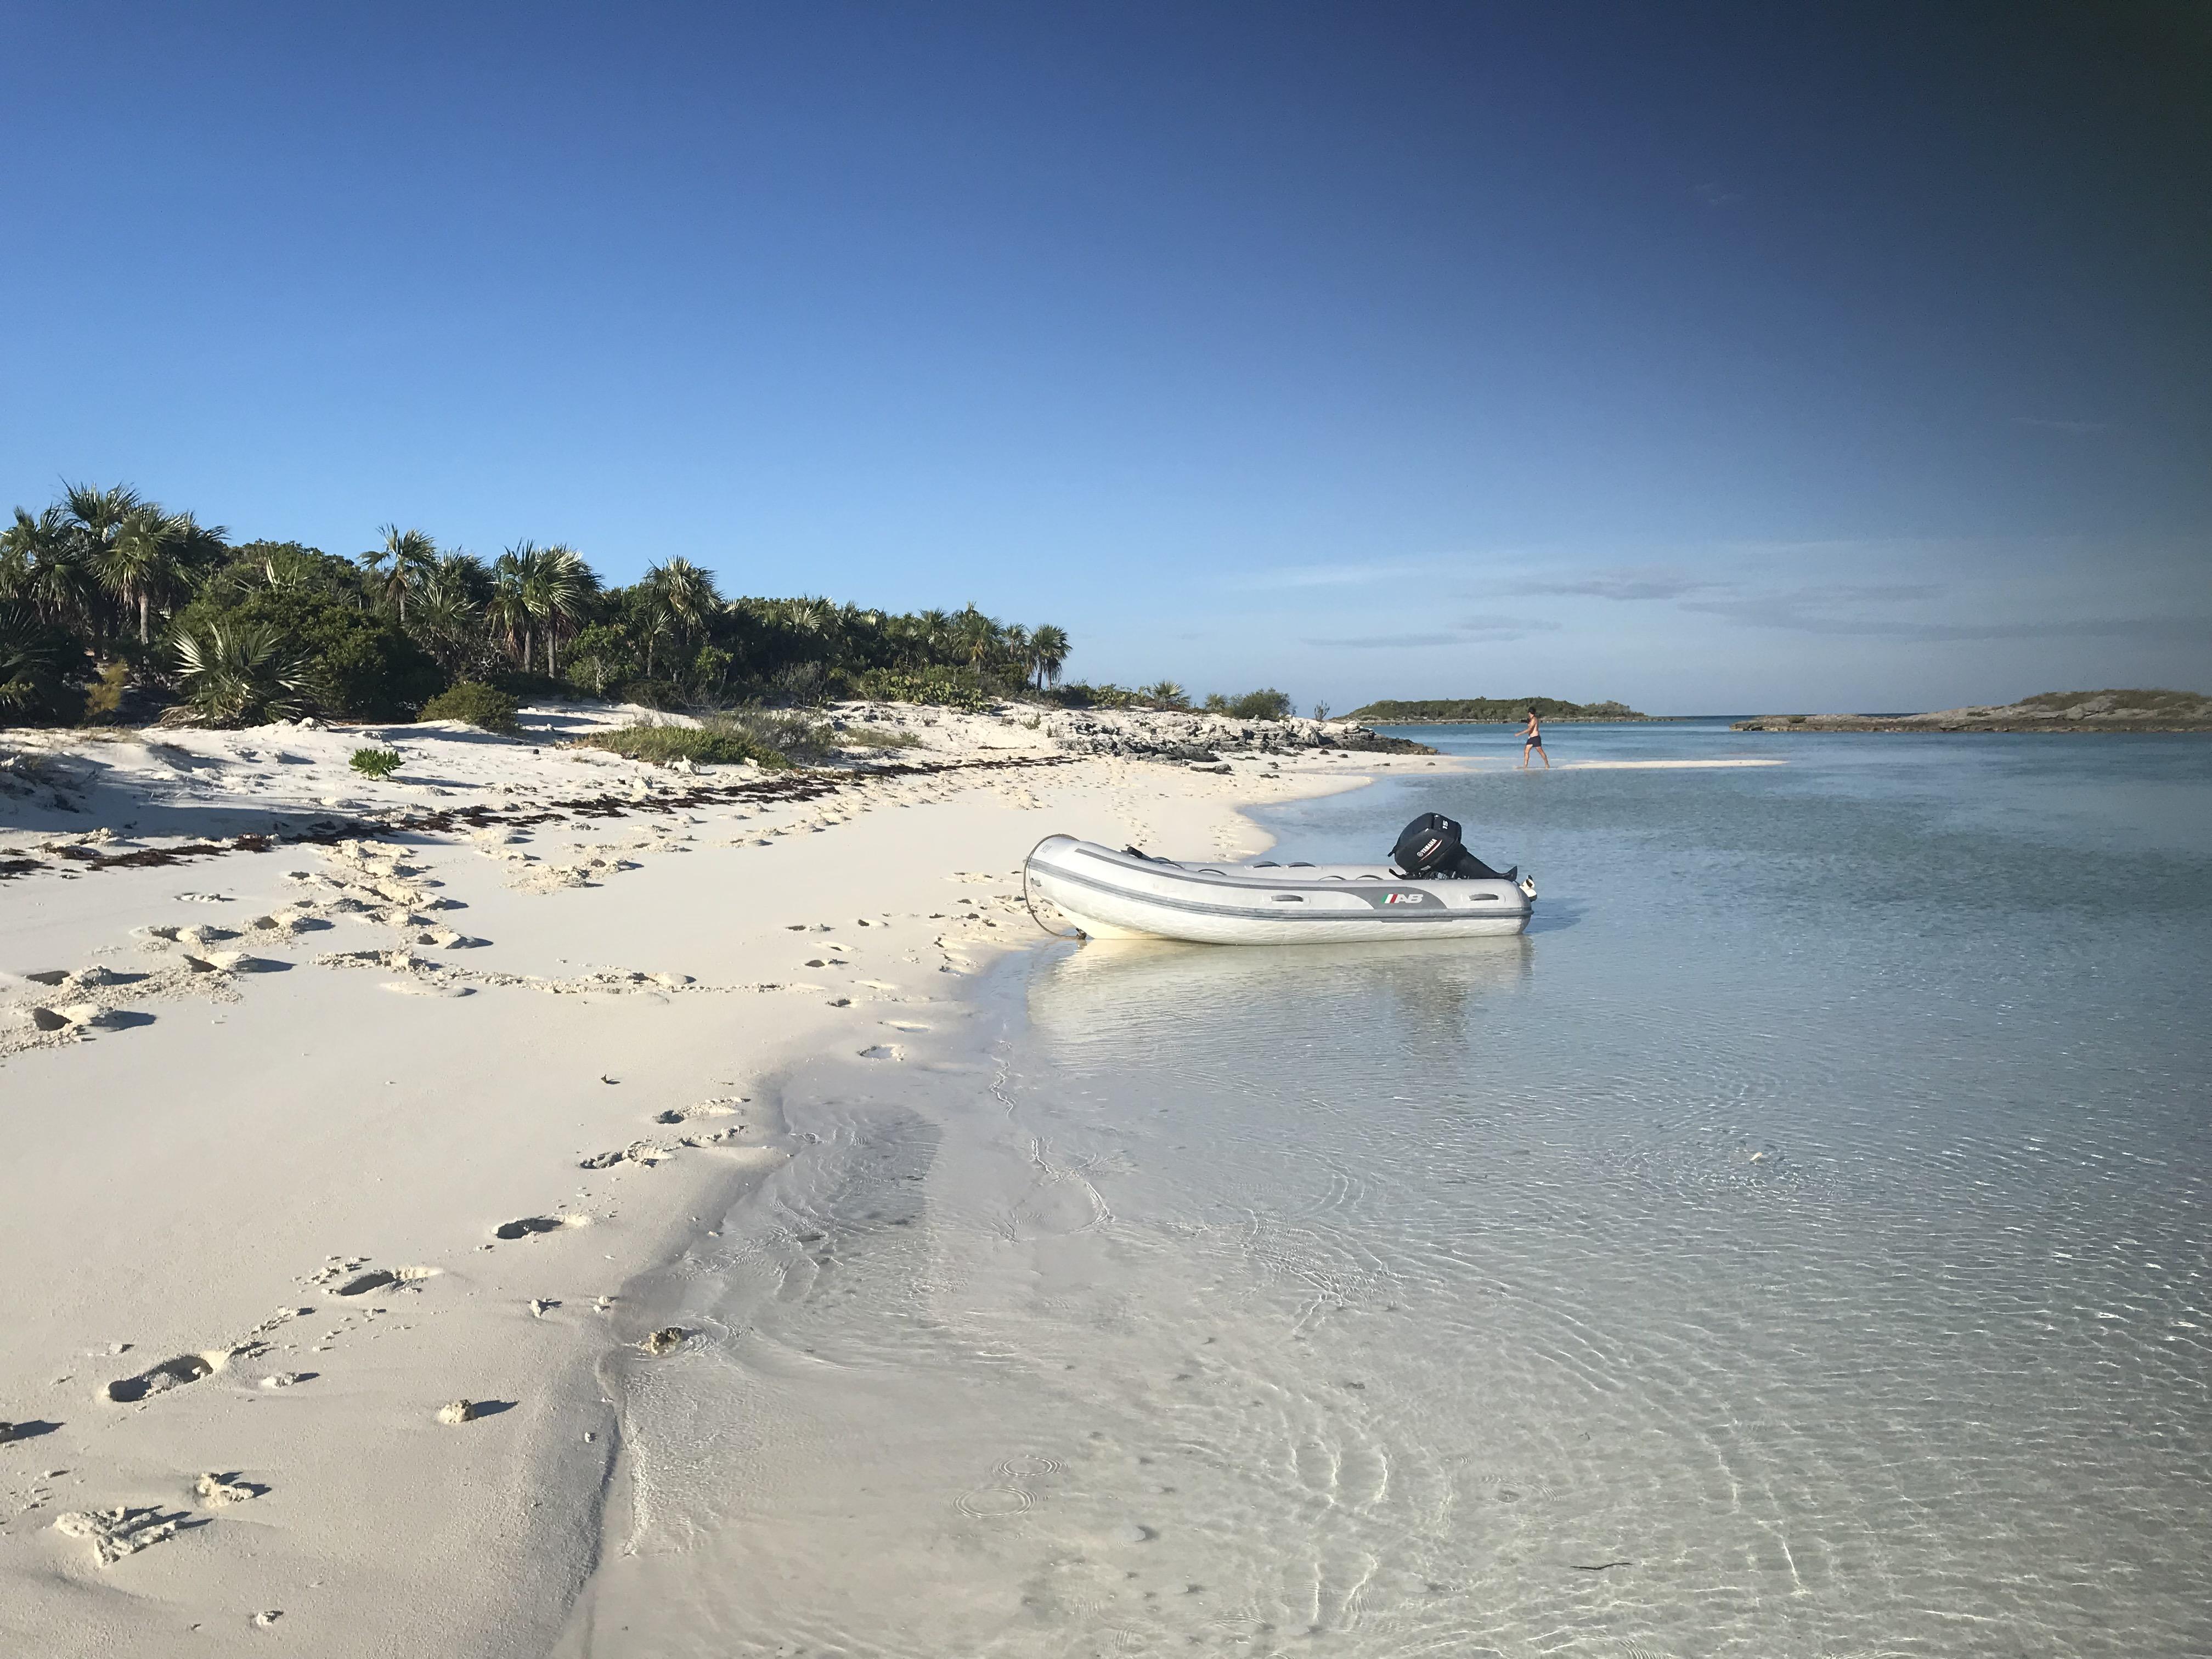 Alquiler-barco-Caribe-yate-motor-velero-catamaran-turismo-vacaciones-Bahamas-playa